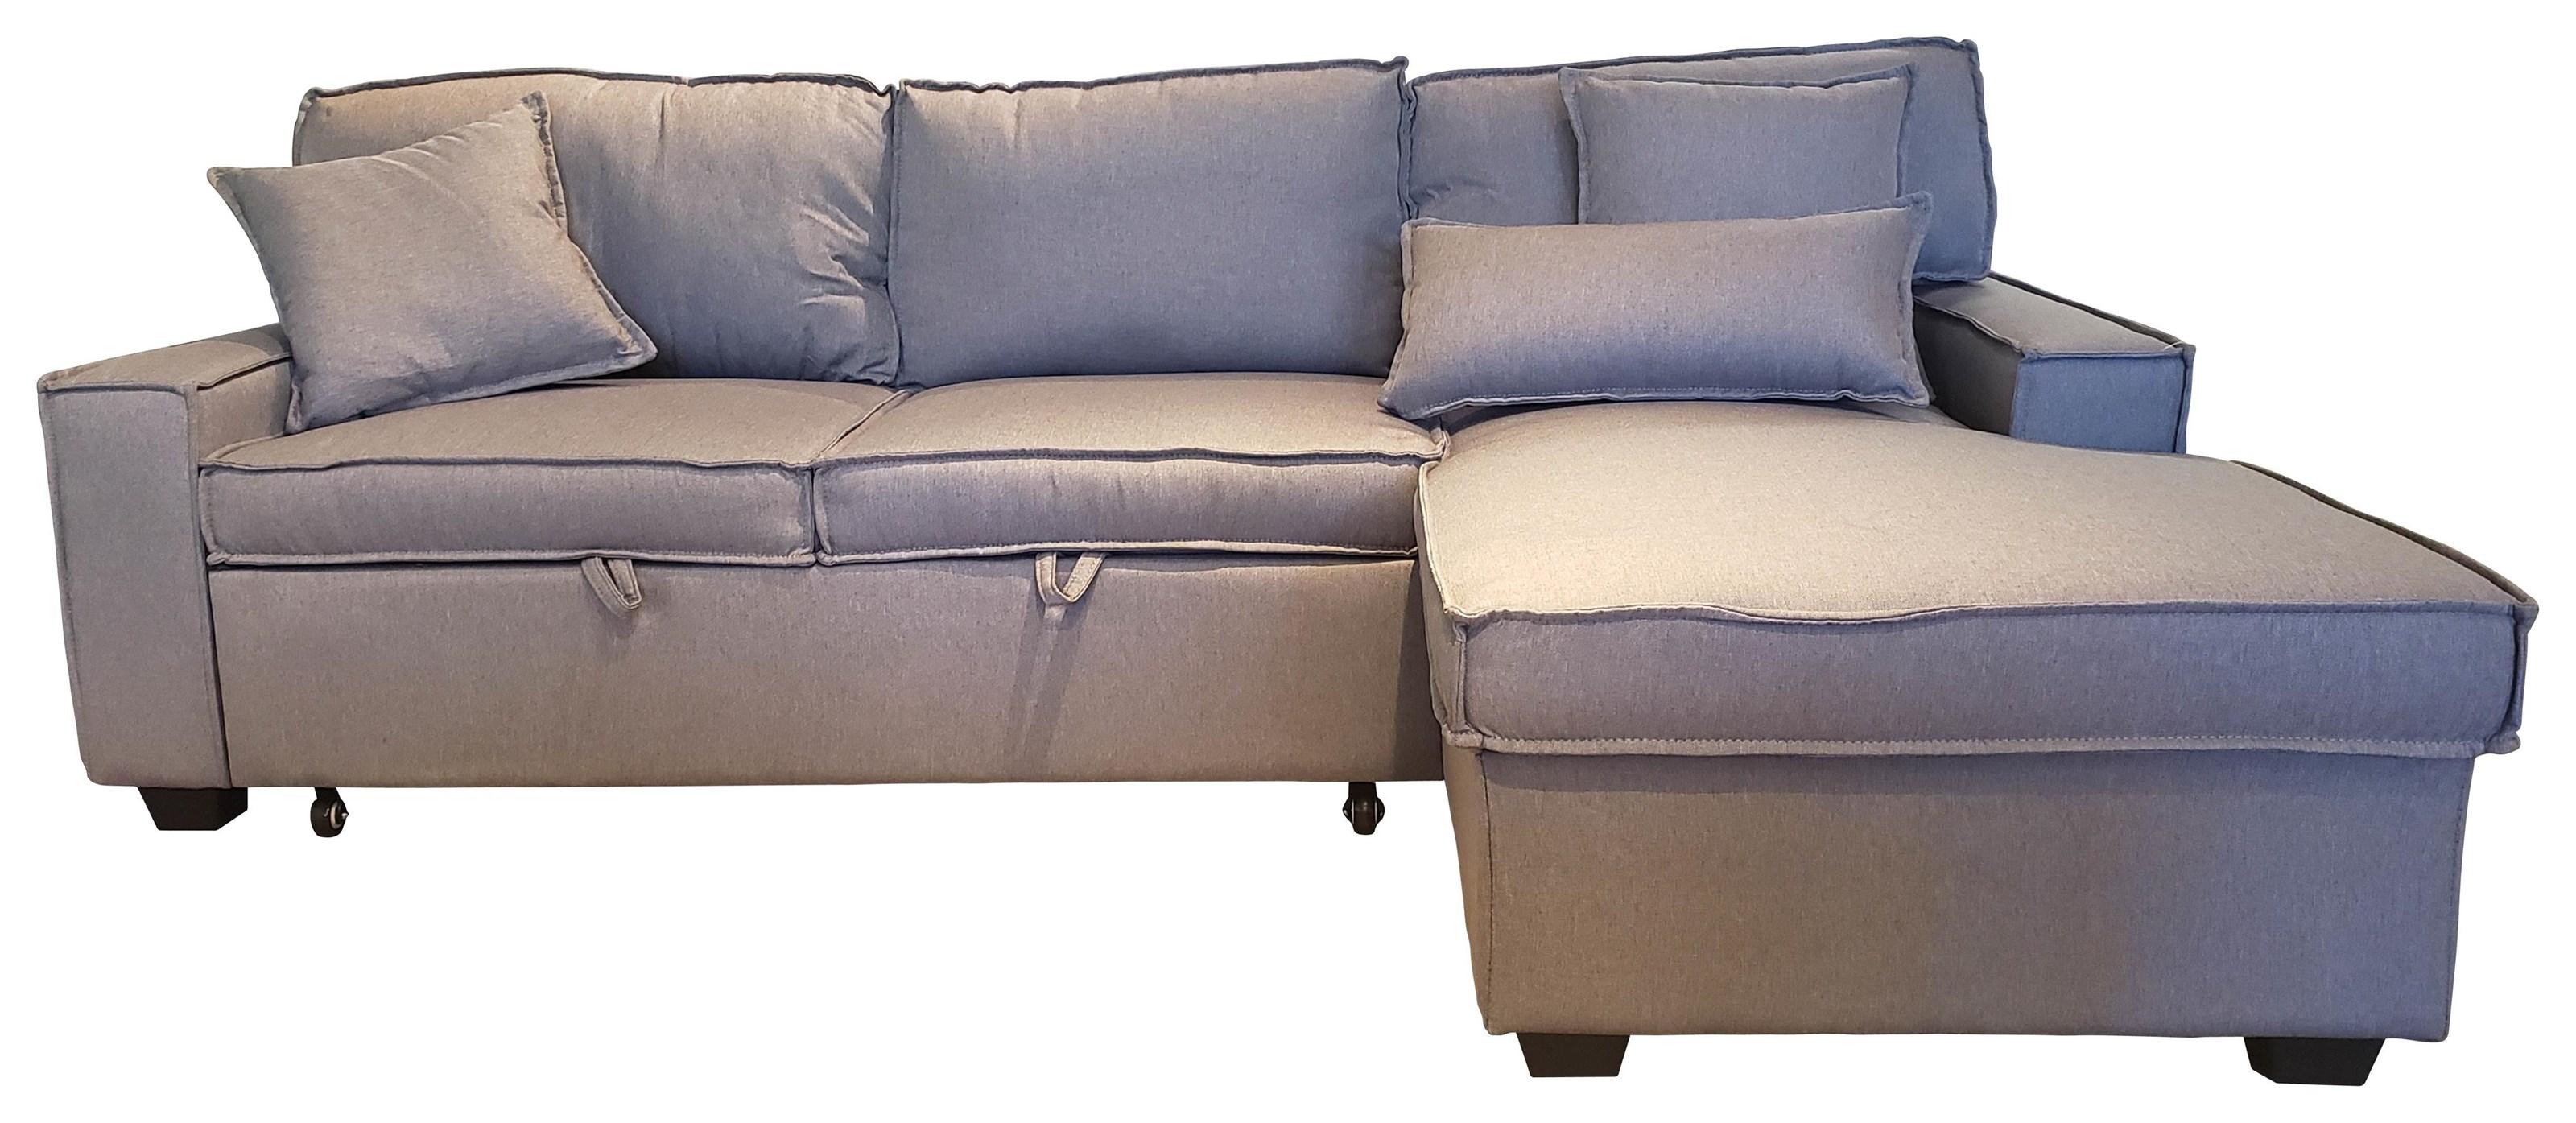 Iris Sleeper Sectional - Grey at Bennett's Furniture and Mattresses